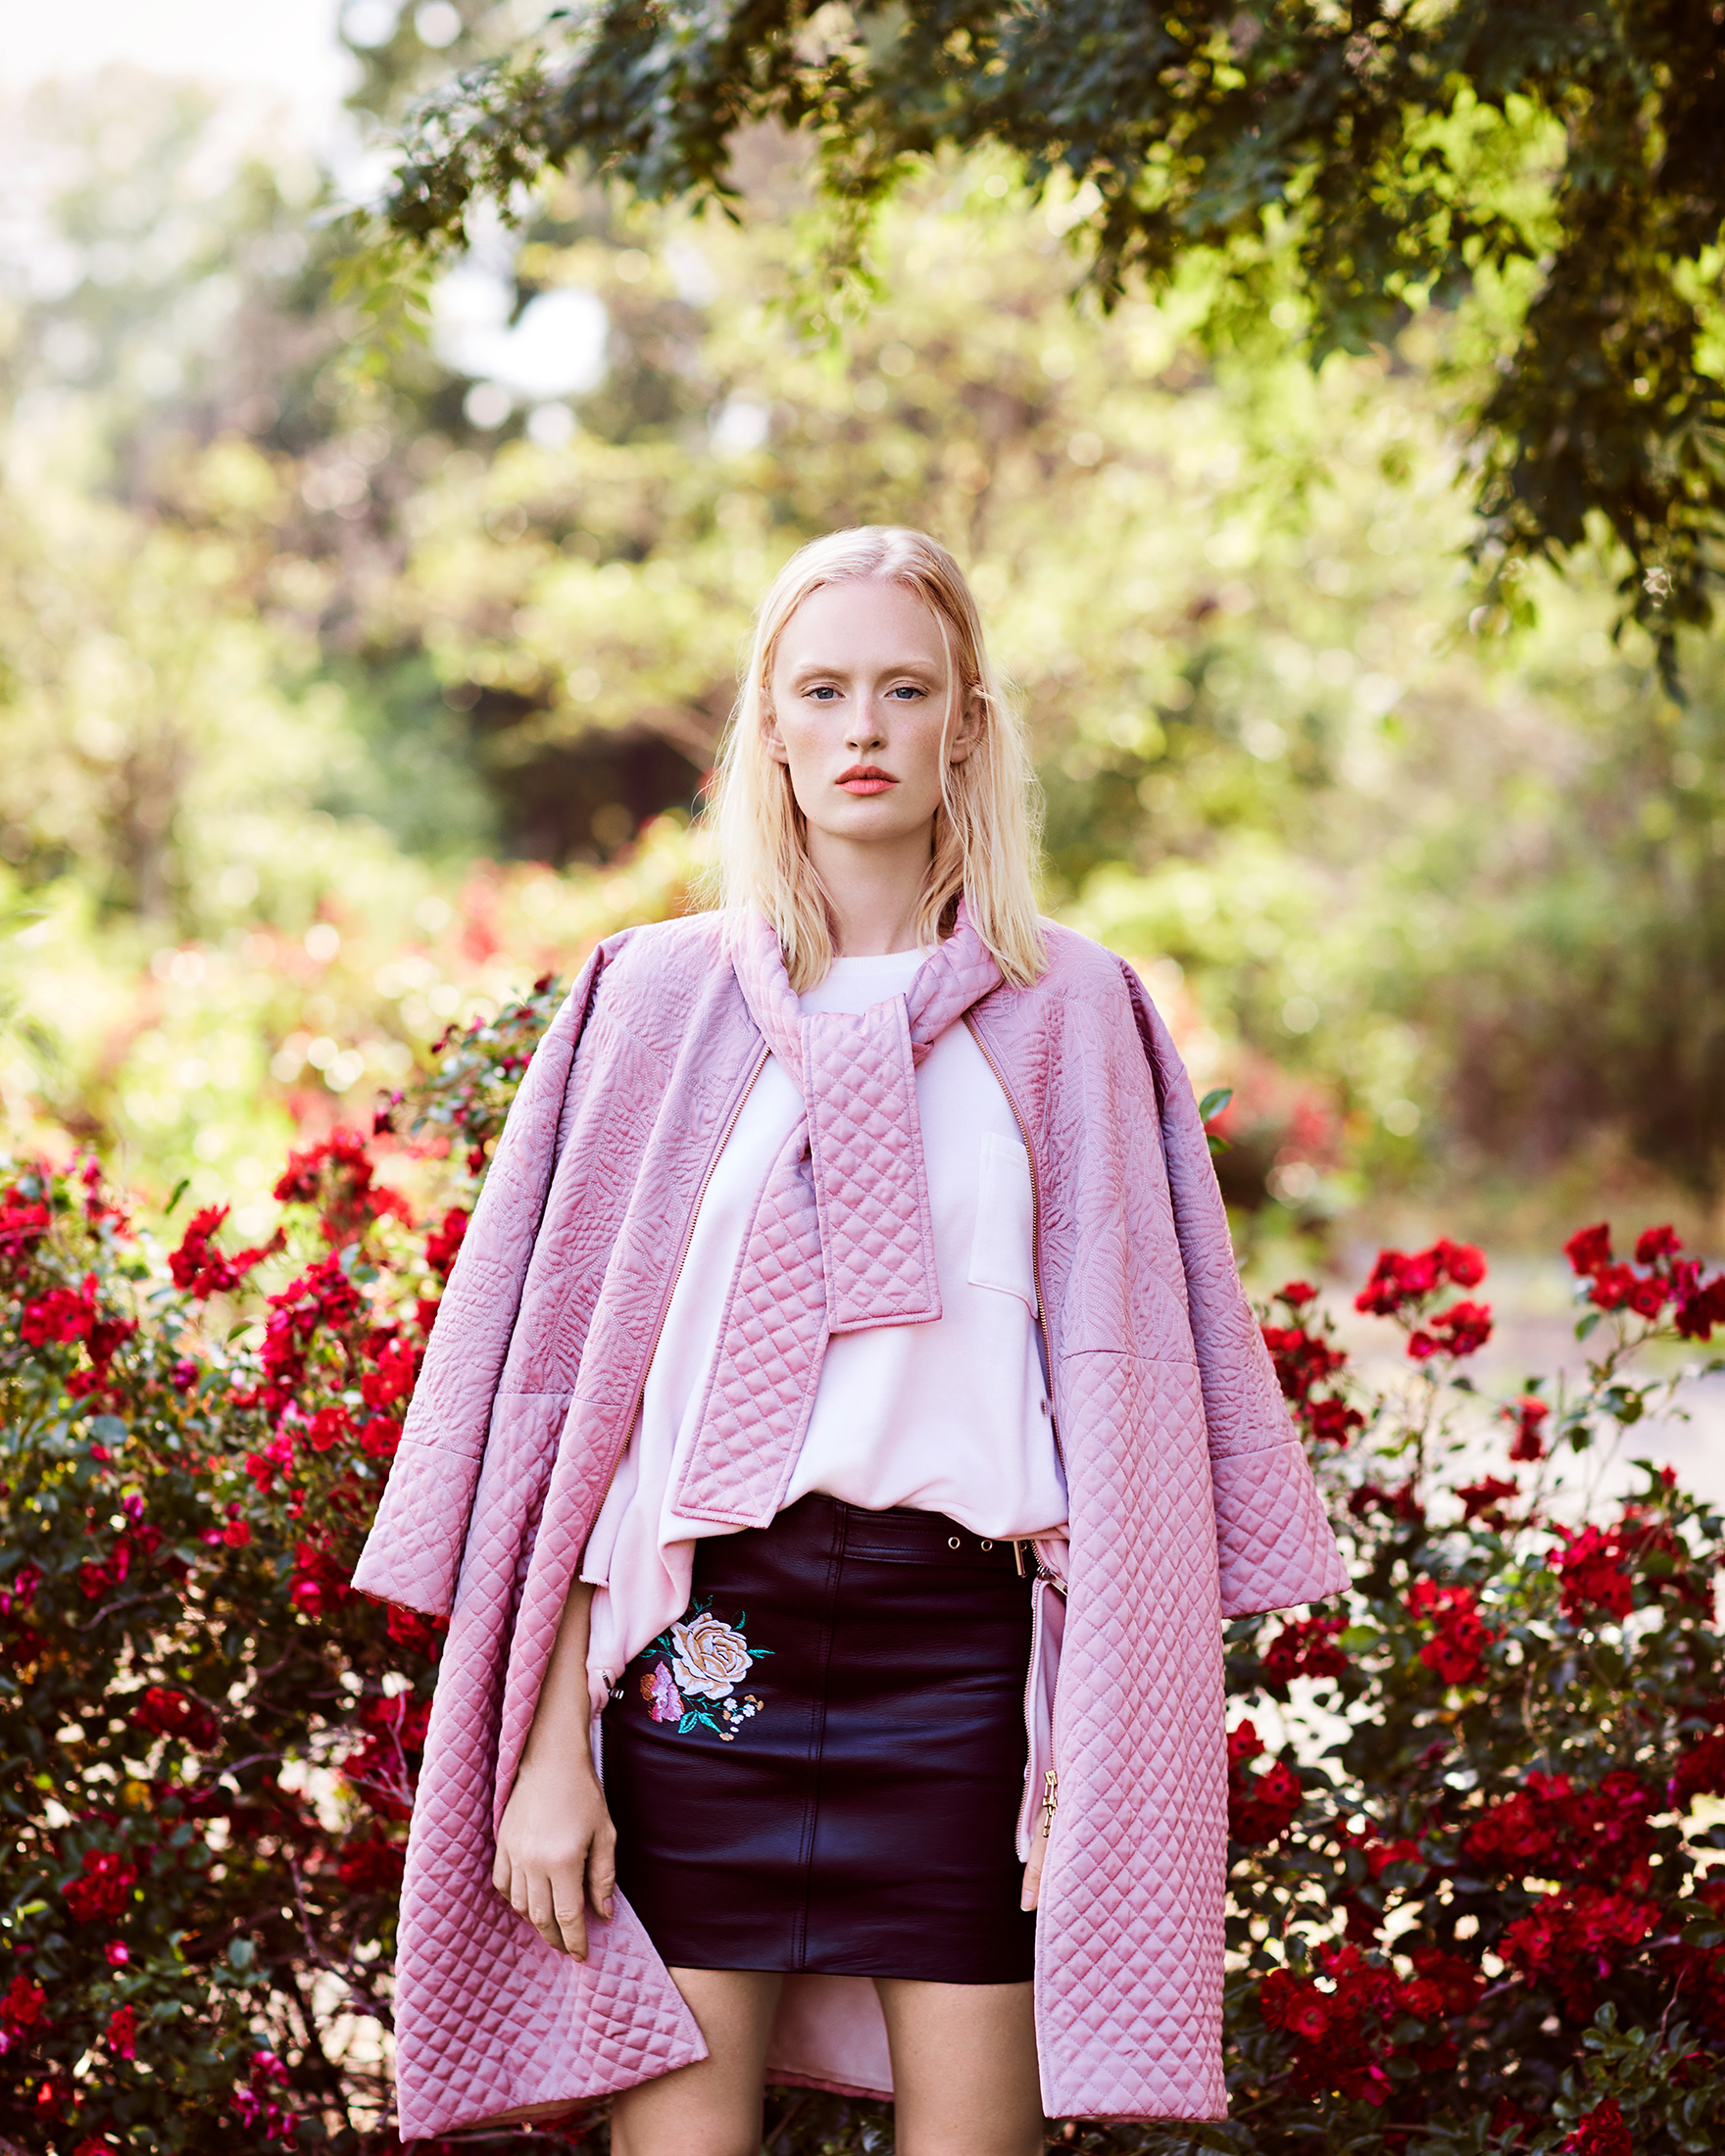 FashionPhotographer_FashionEditorial_By_BriJohnson_00010081.jpg